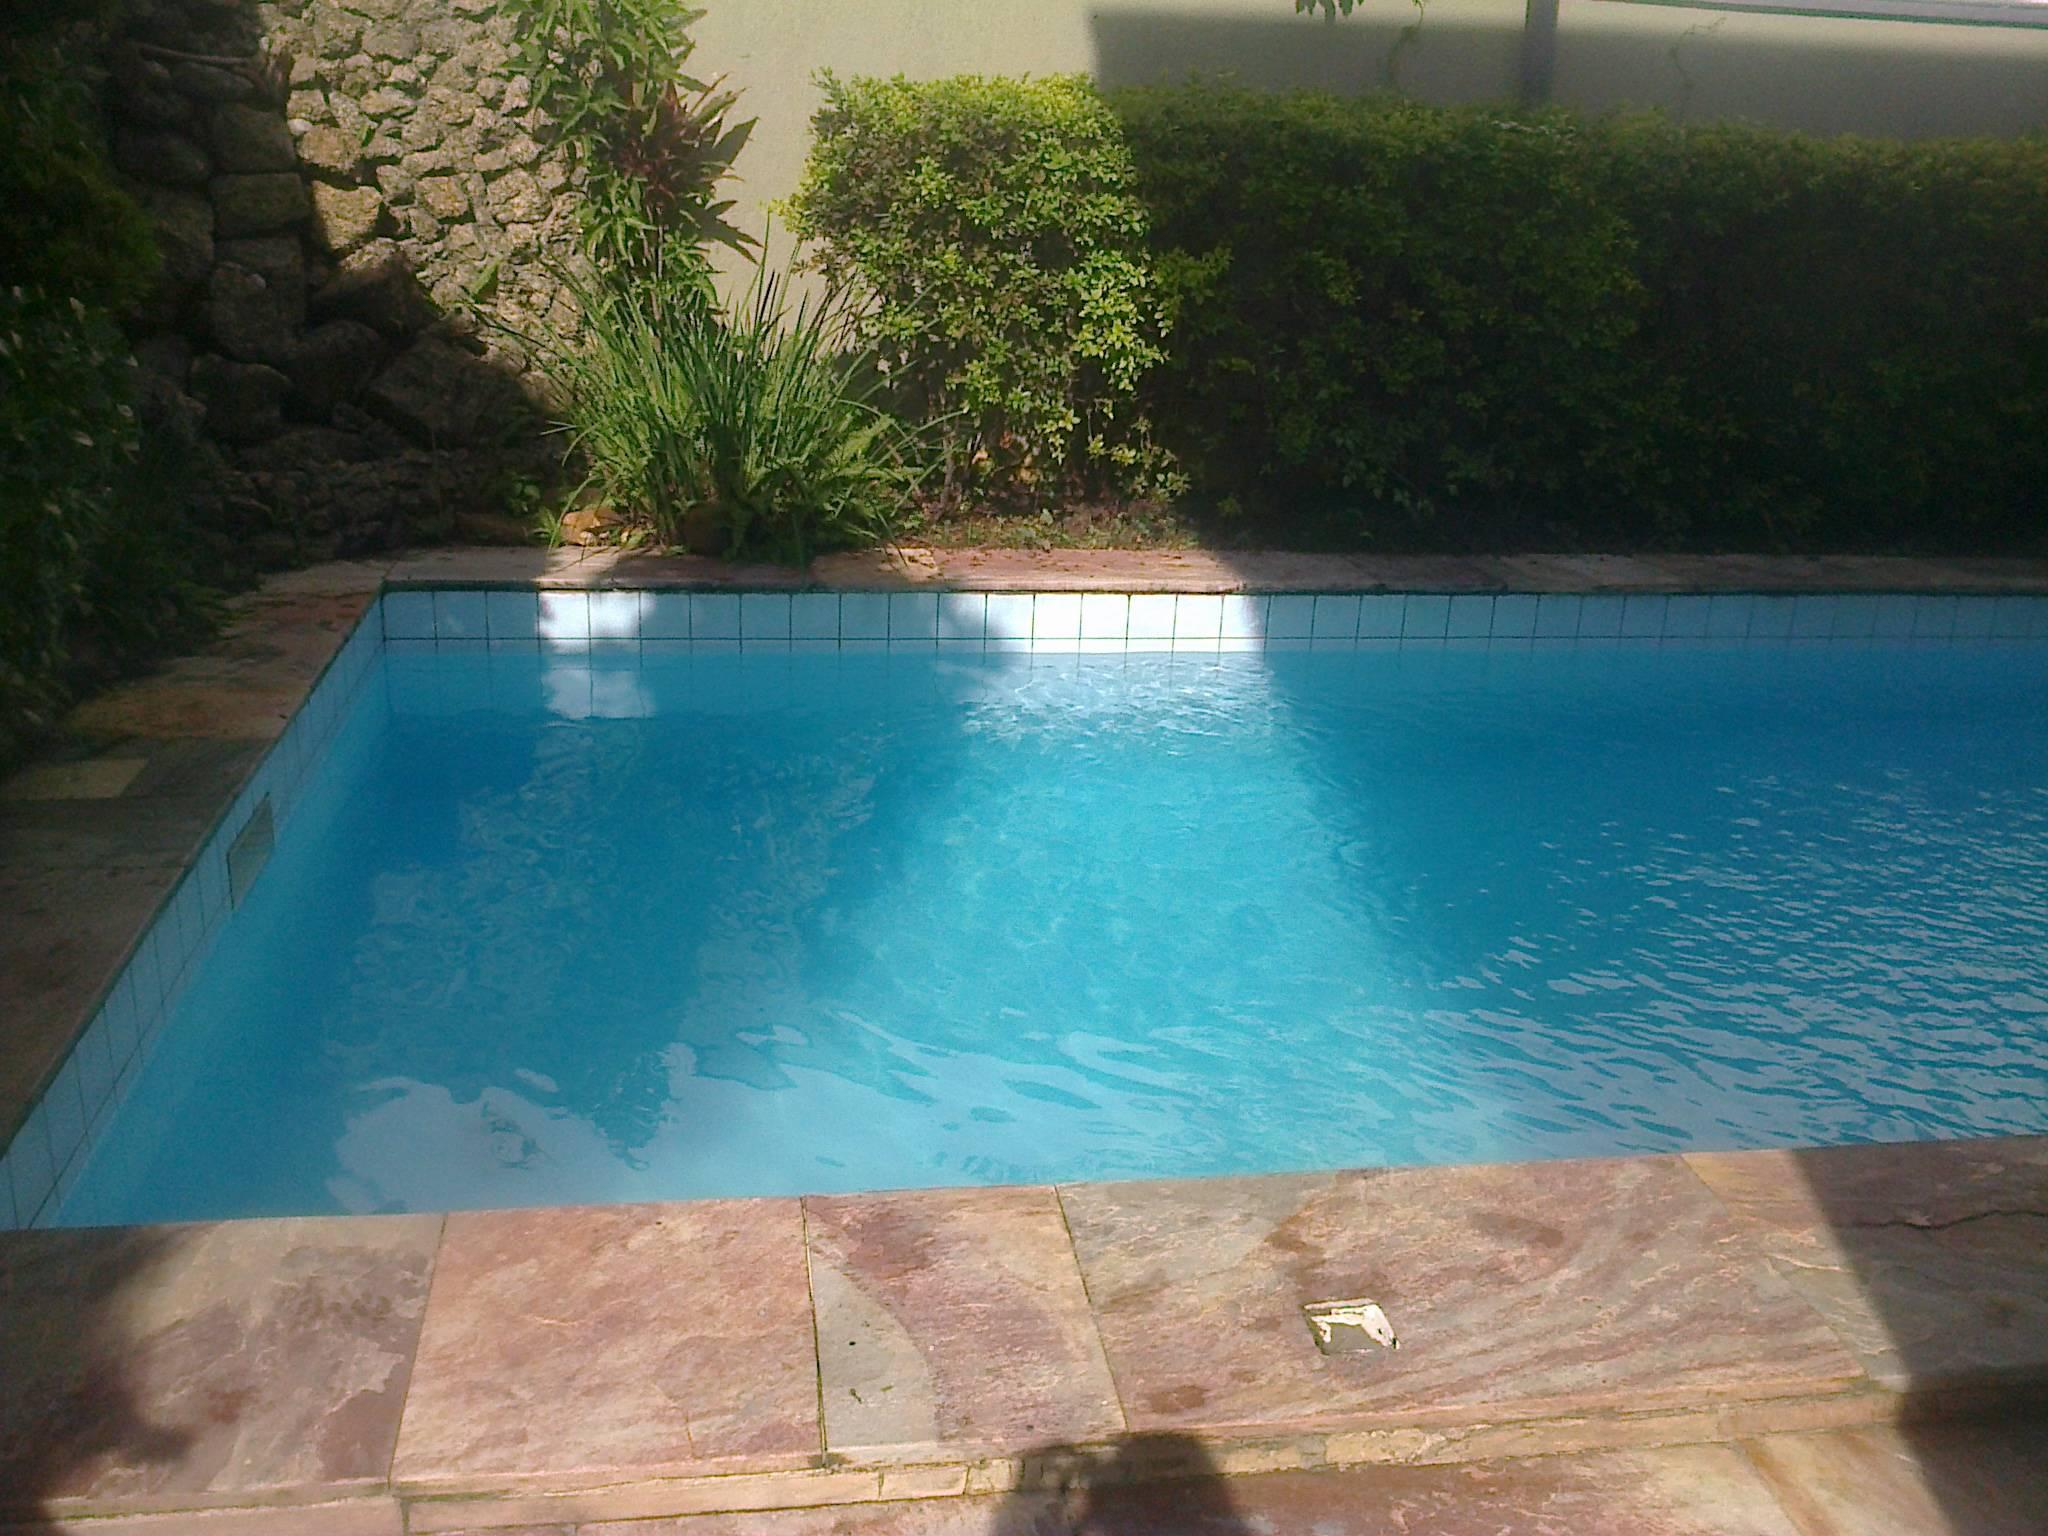 Empresa para limpar filtro de piscina qualy tratus piscinas for Empresas de piscinas